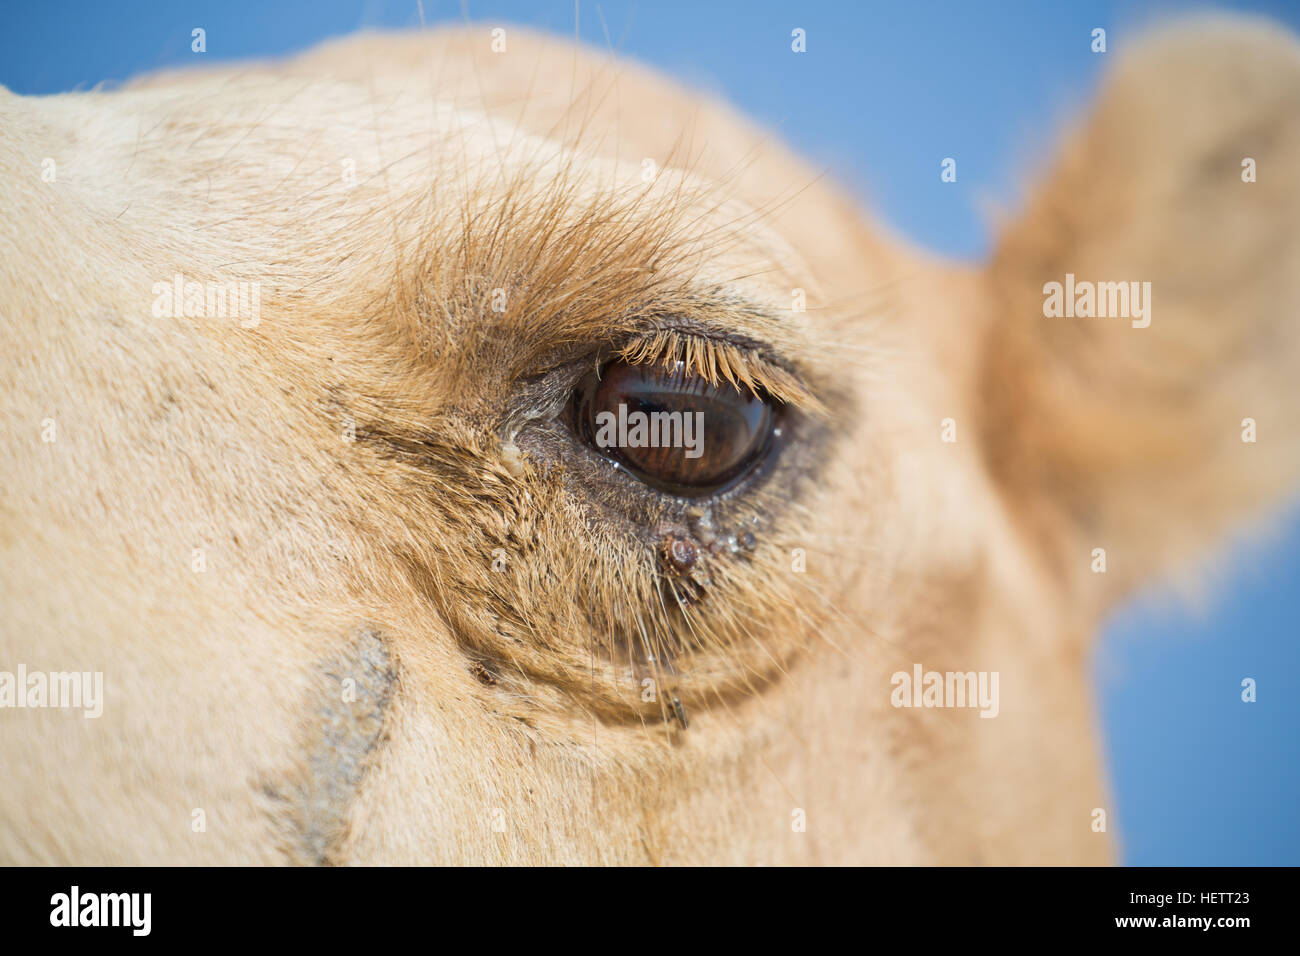 A camel's eye - Stock Image